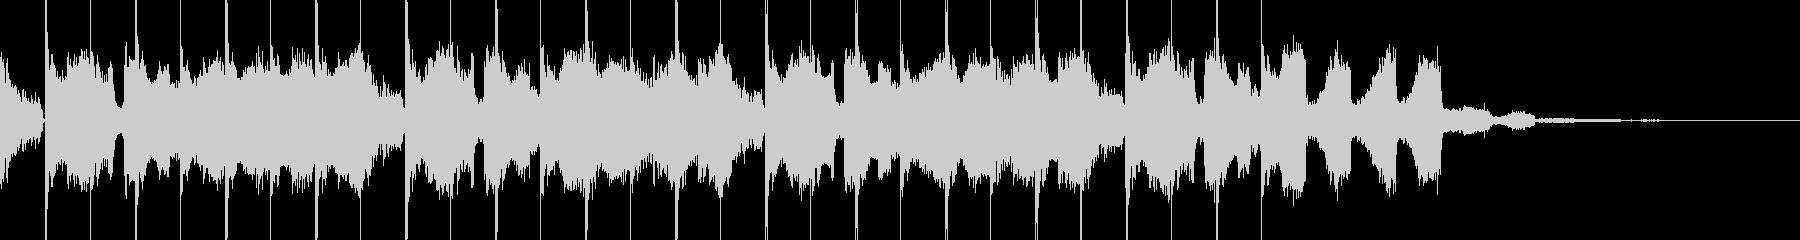 EDM・近未来的オープニングCMジングルの未再生の波形